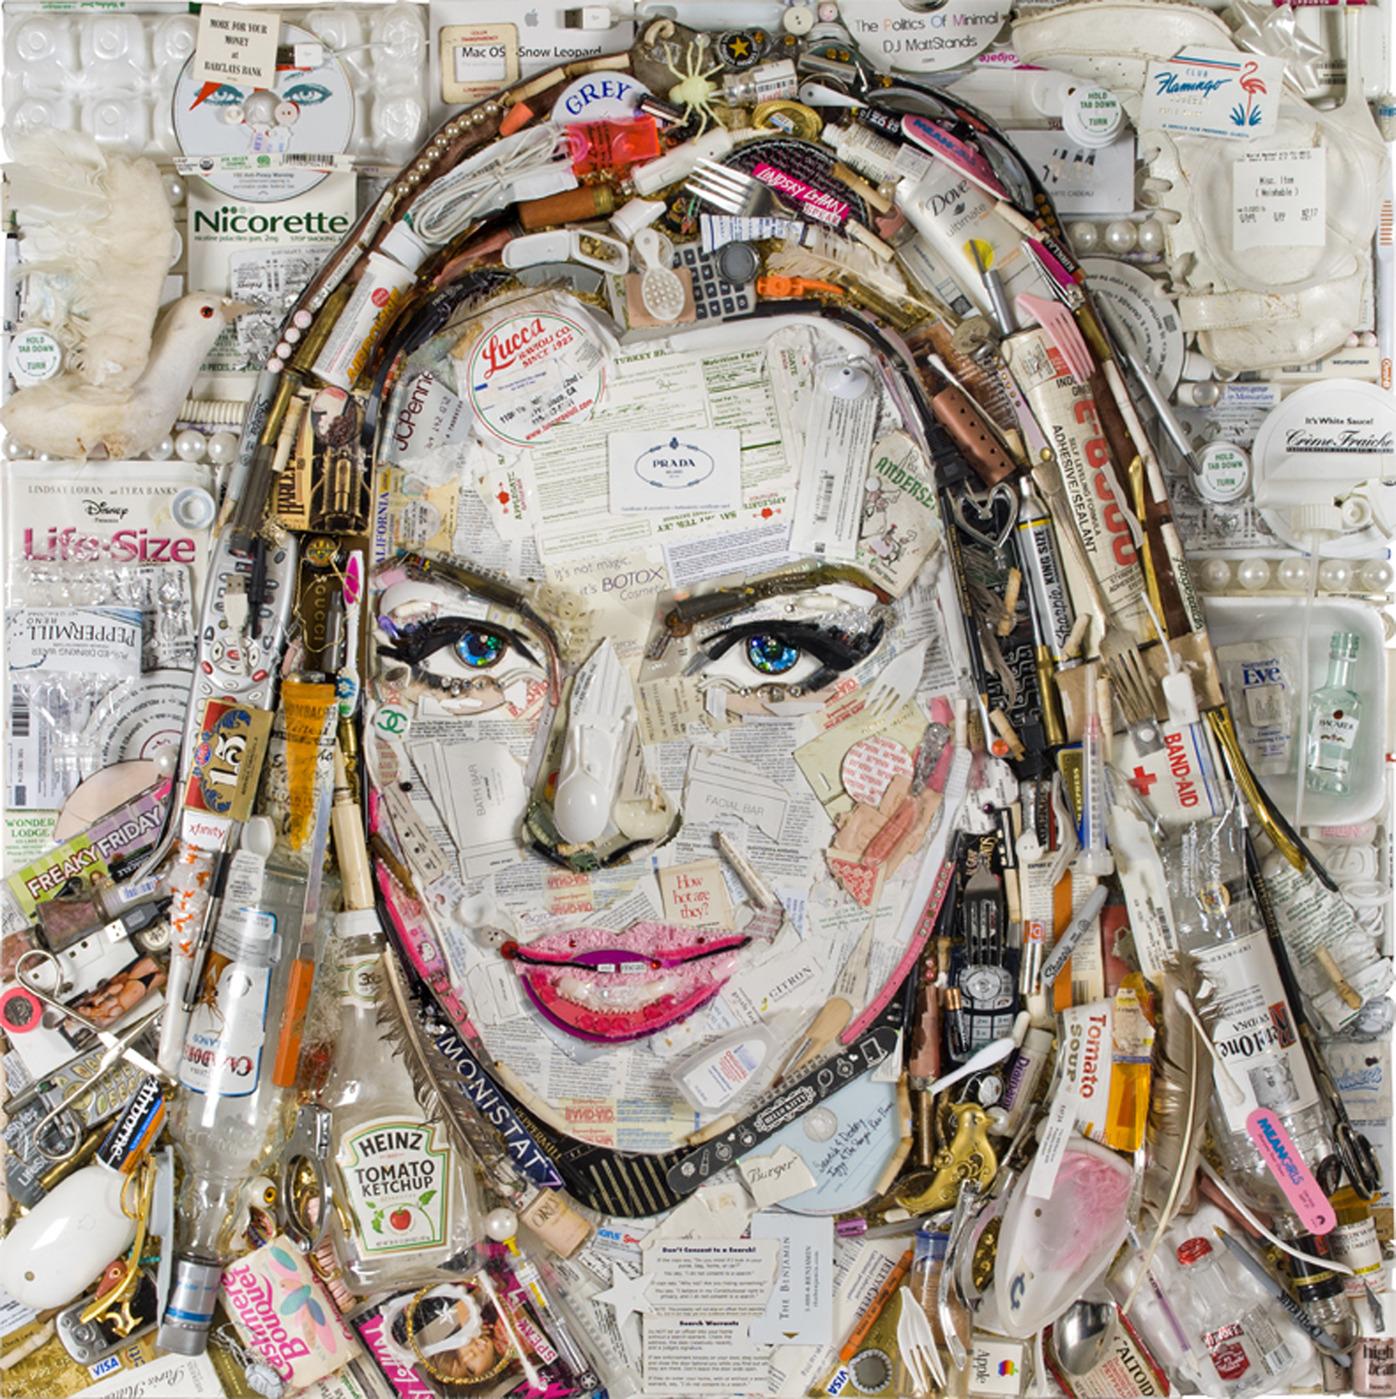 Lindsay Lohan by Jason Mercier